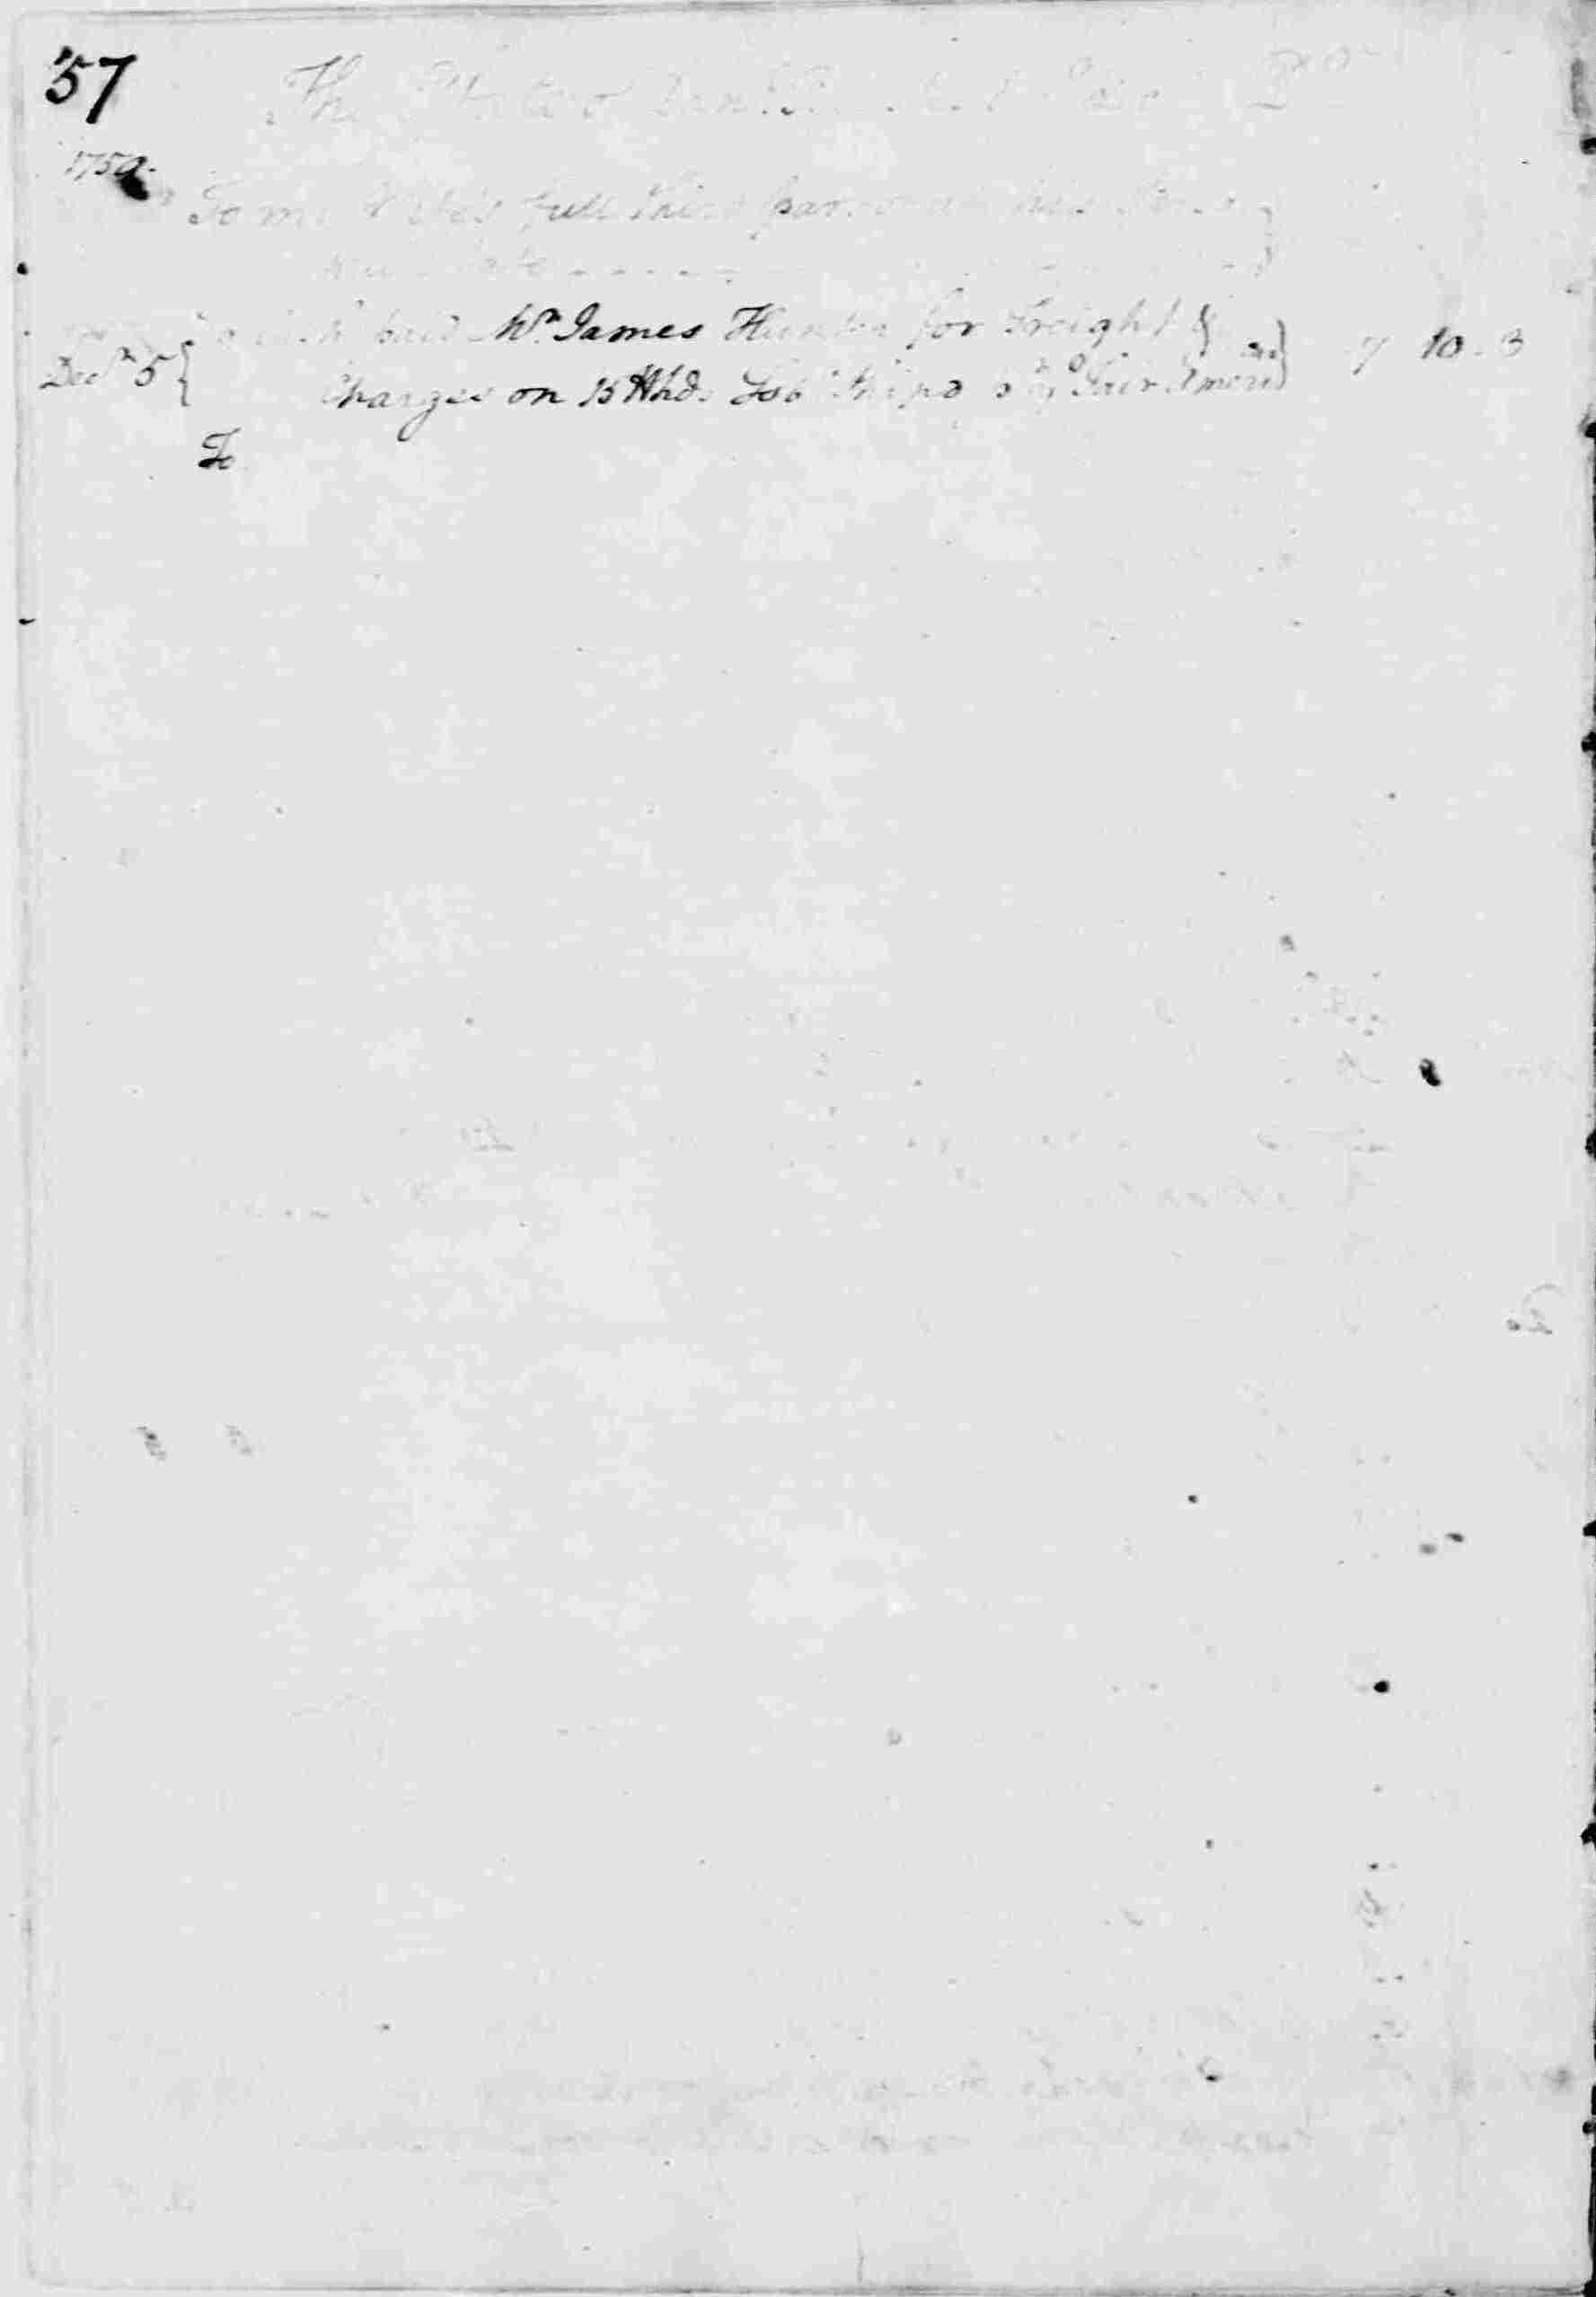 Ledger A, folio 57, left side